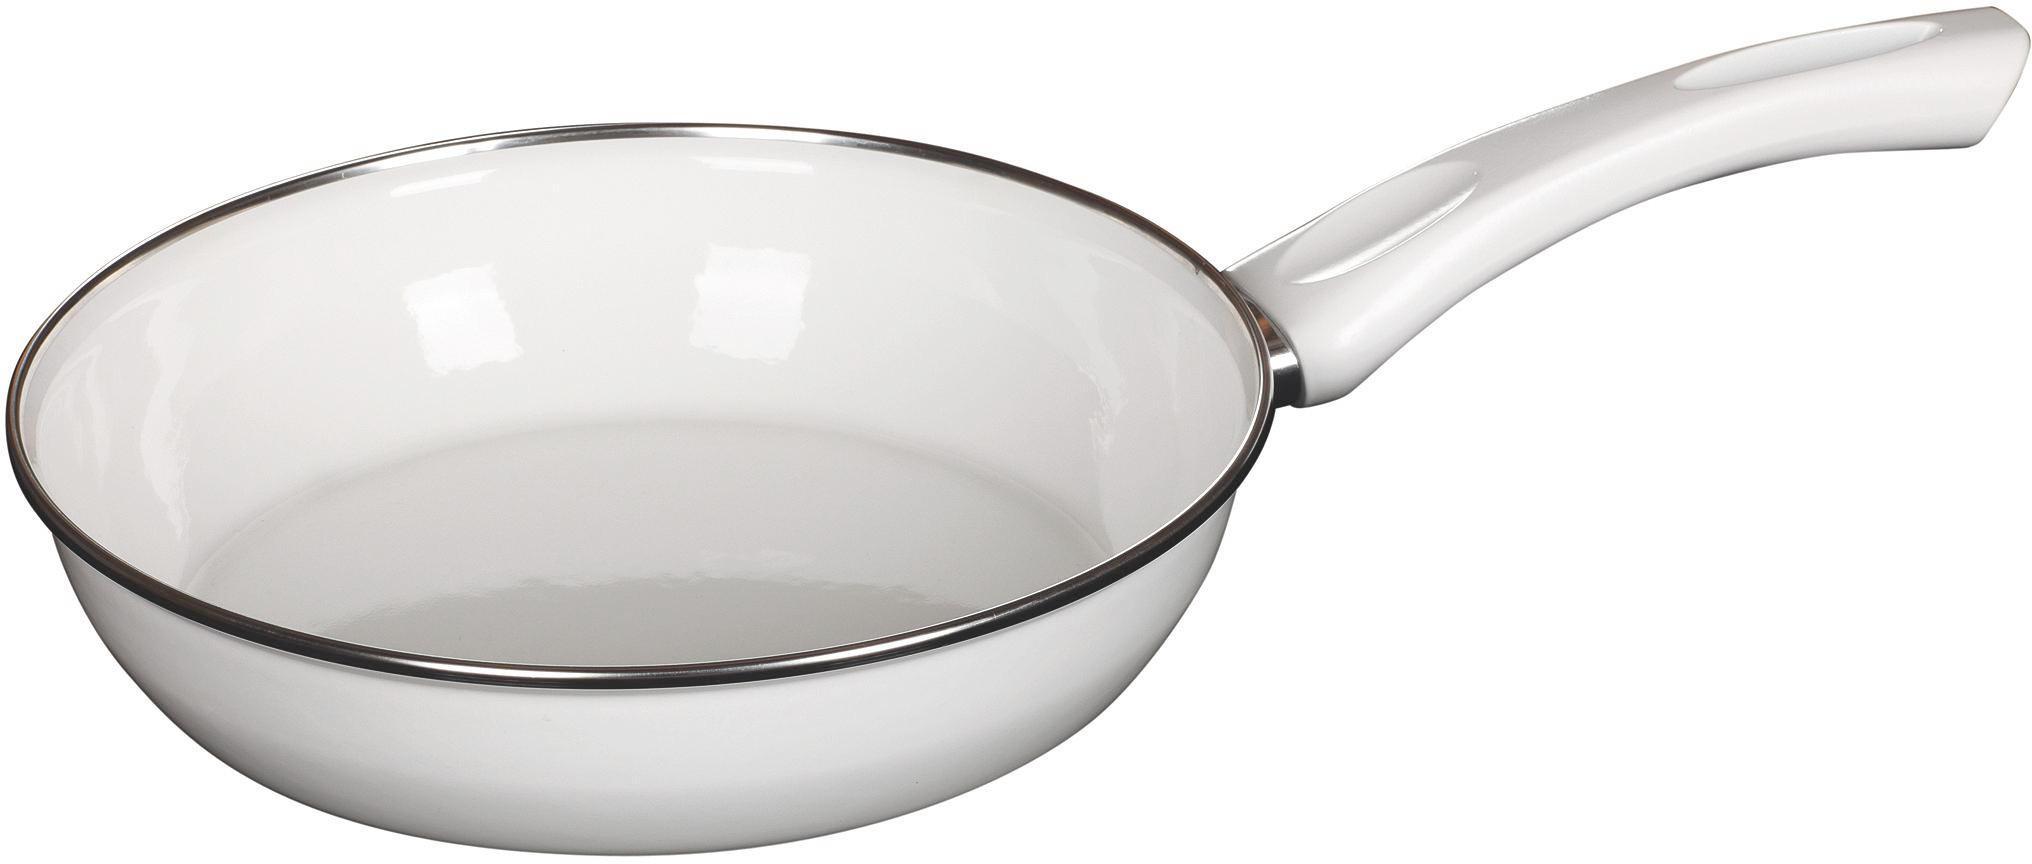 Ceraglaspfanne 24 cm 24 cm - Weiß, Metall (24cm) - RIESS